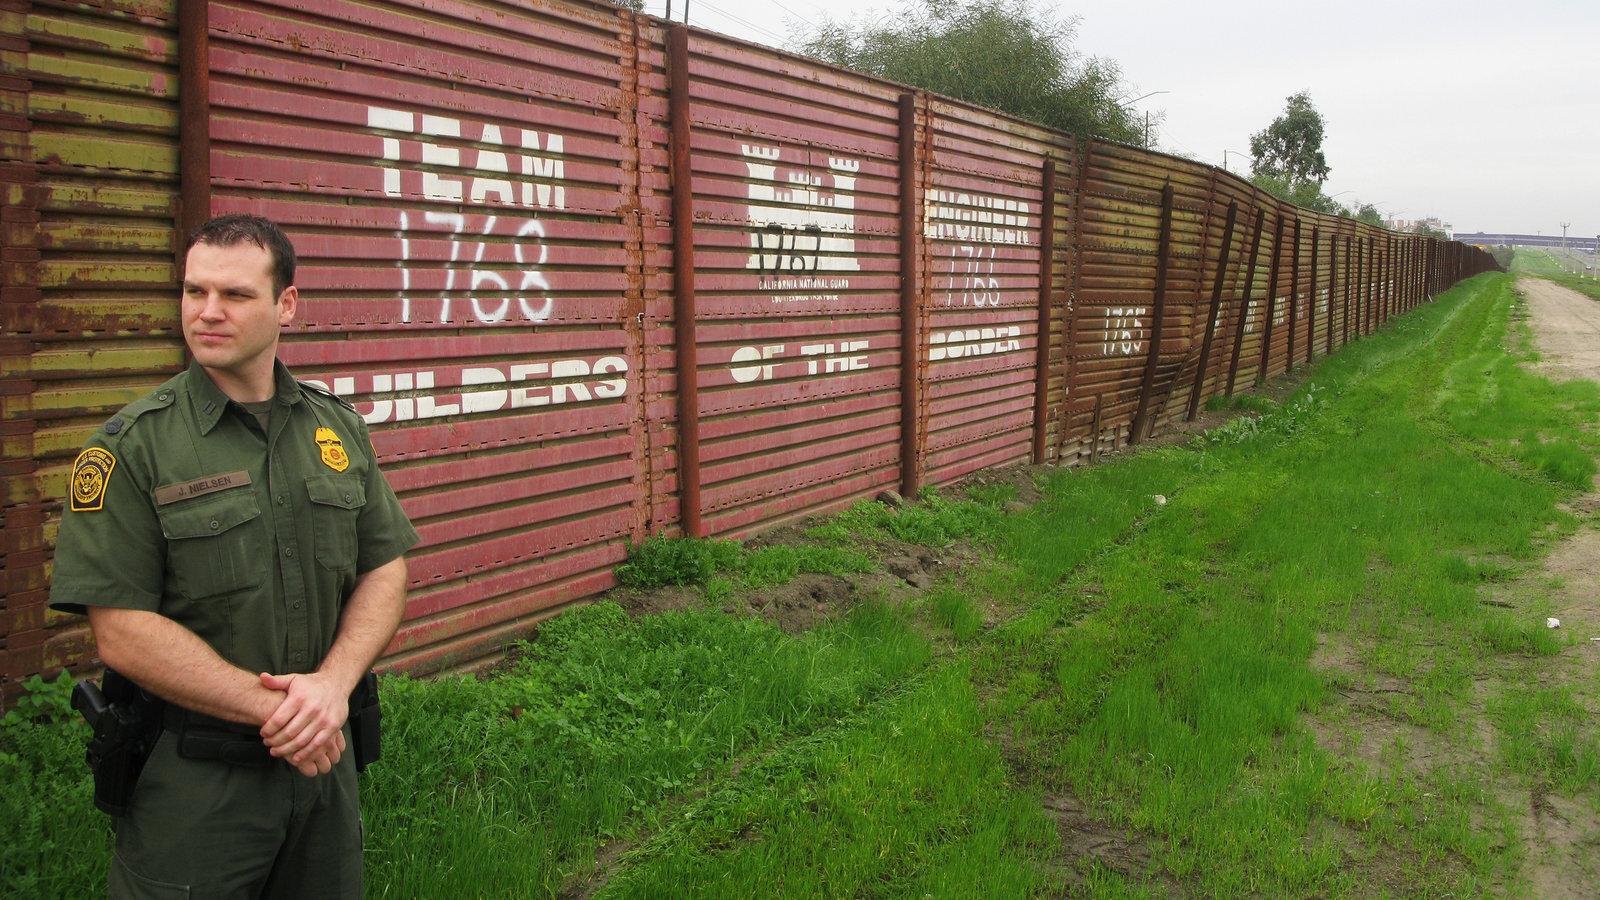 Border Patrol agent James Nielsen stands near the original Vietnam-era landing-mat border fence near Chula Vista, Calif. Credit:  NPR